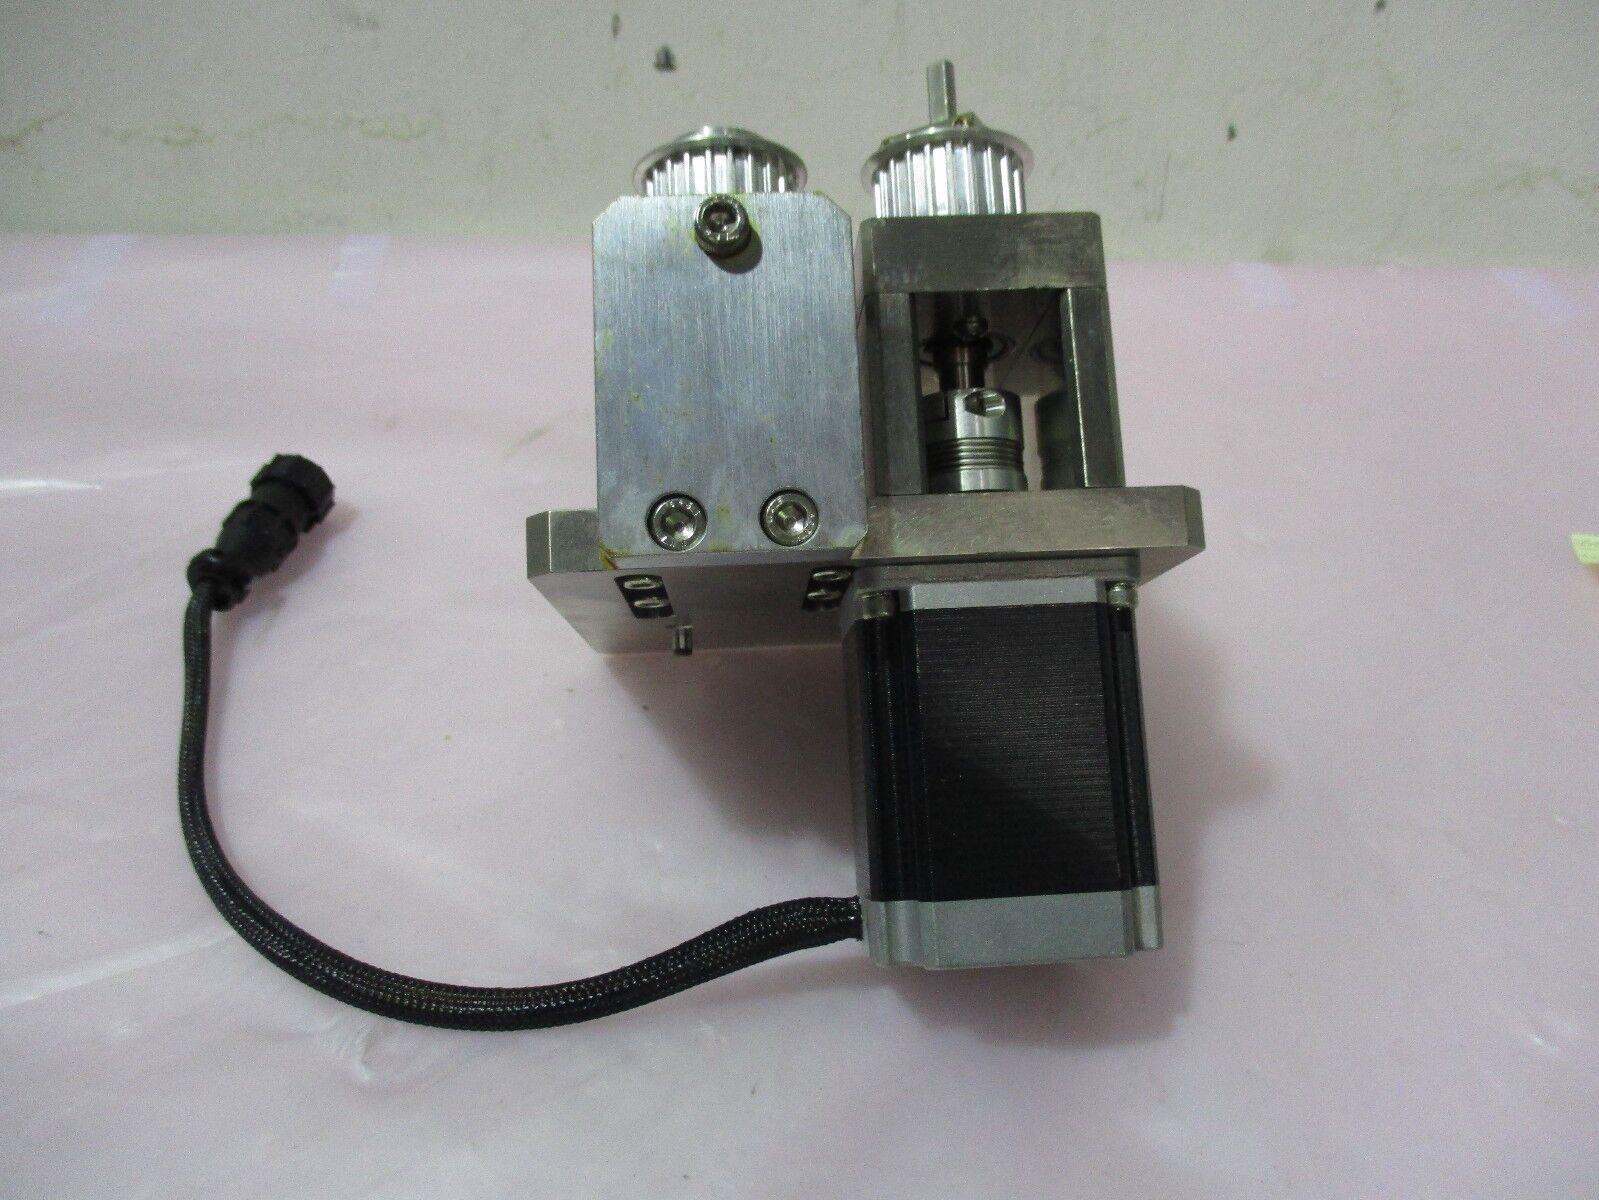 Tamagawa TS3653N95E8 Stepper Motor Assembly, 4.5, 2A, 420675